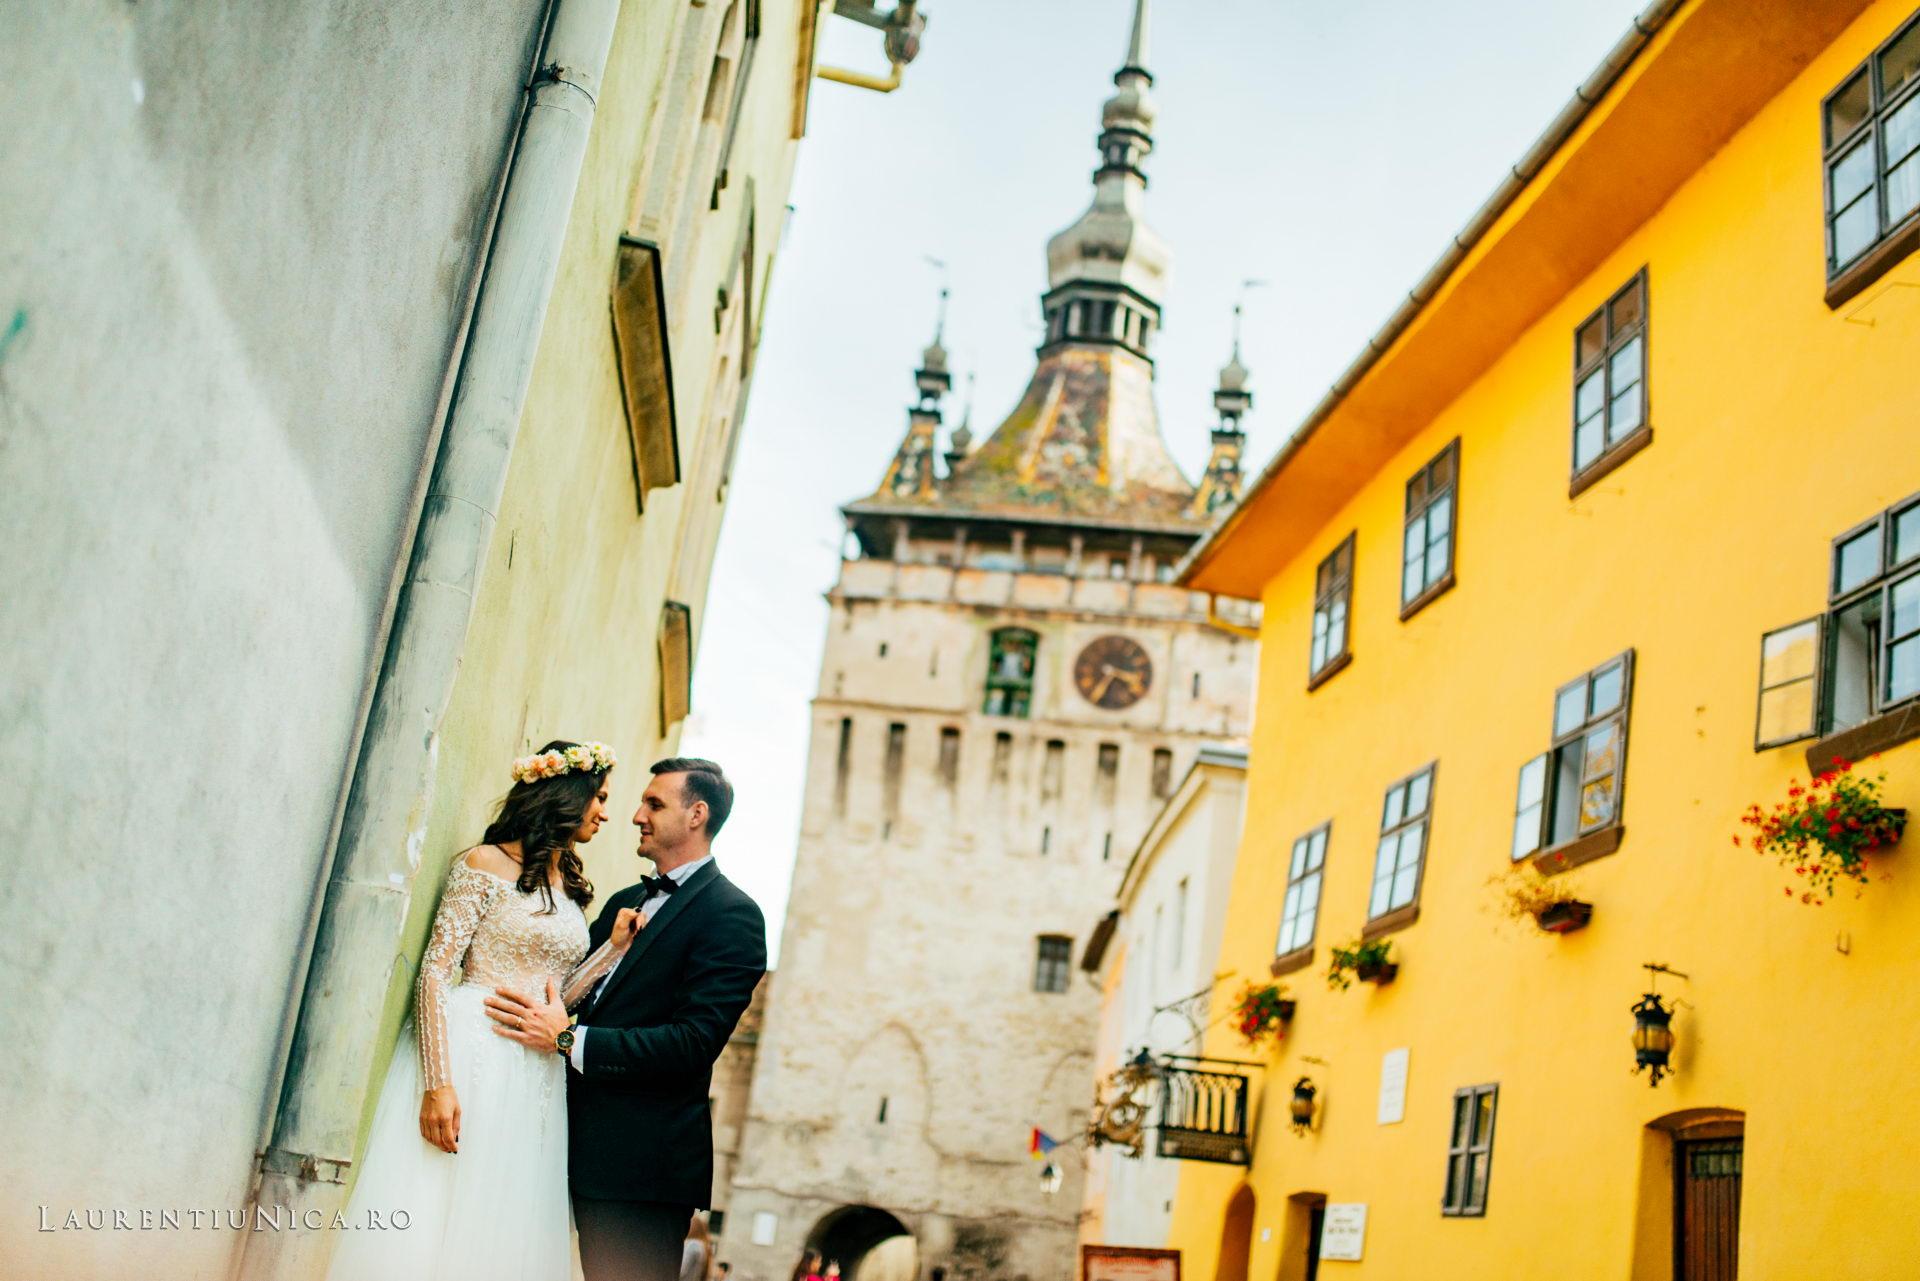 lili-si-dan-fotografii-nunta-after-wedding-sighisoara-laurentiu-nica14